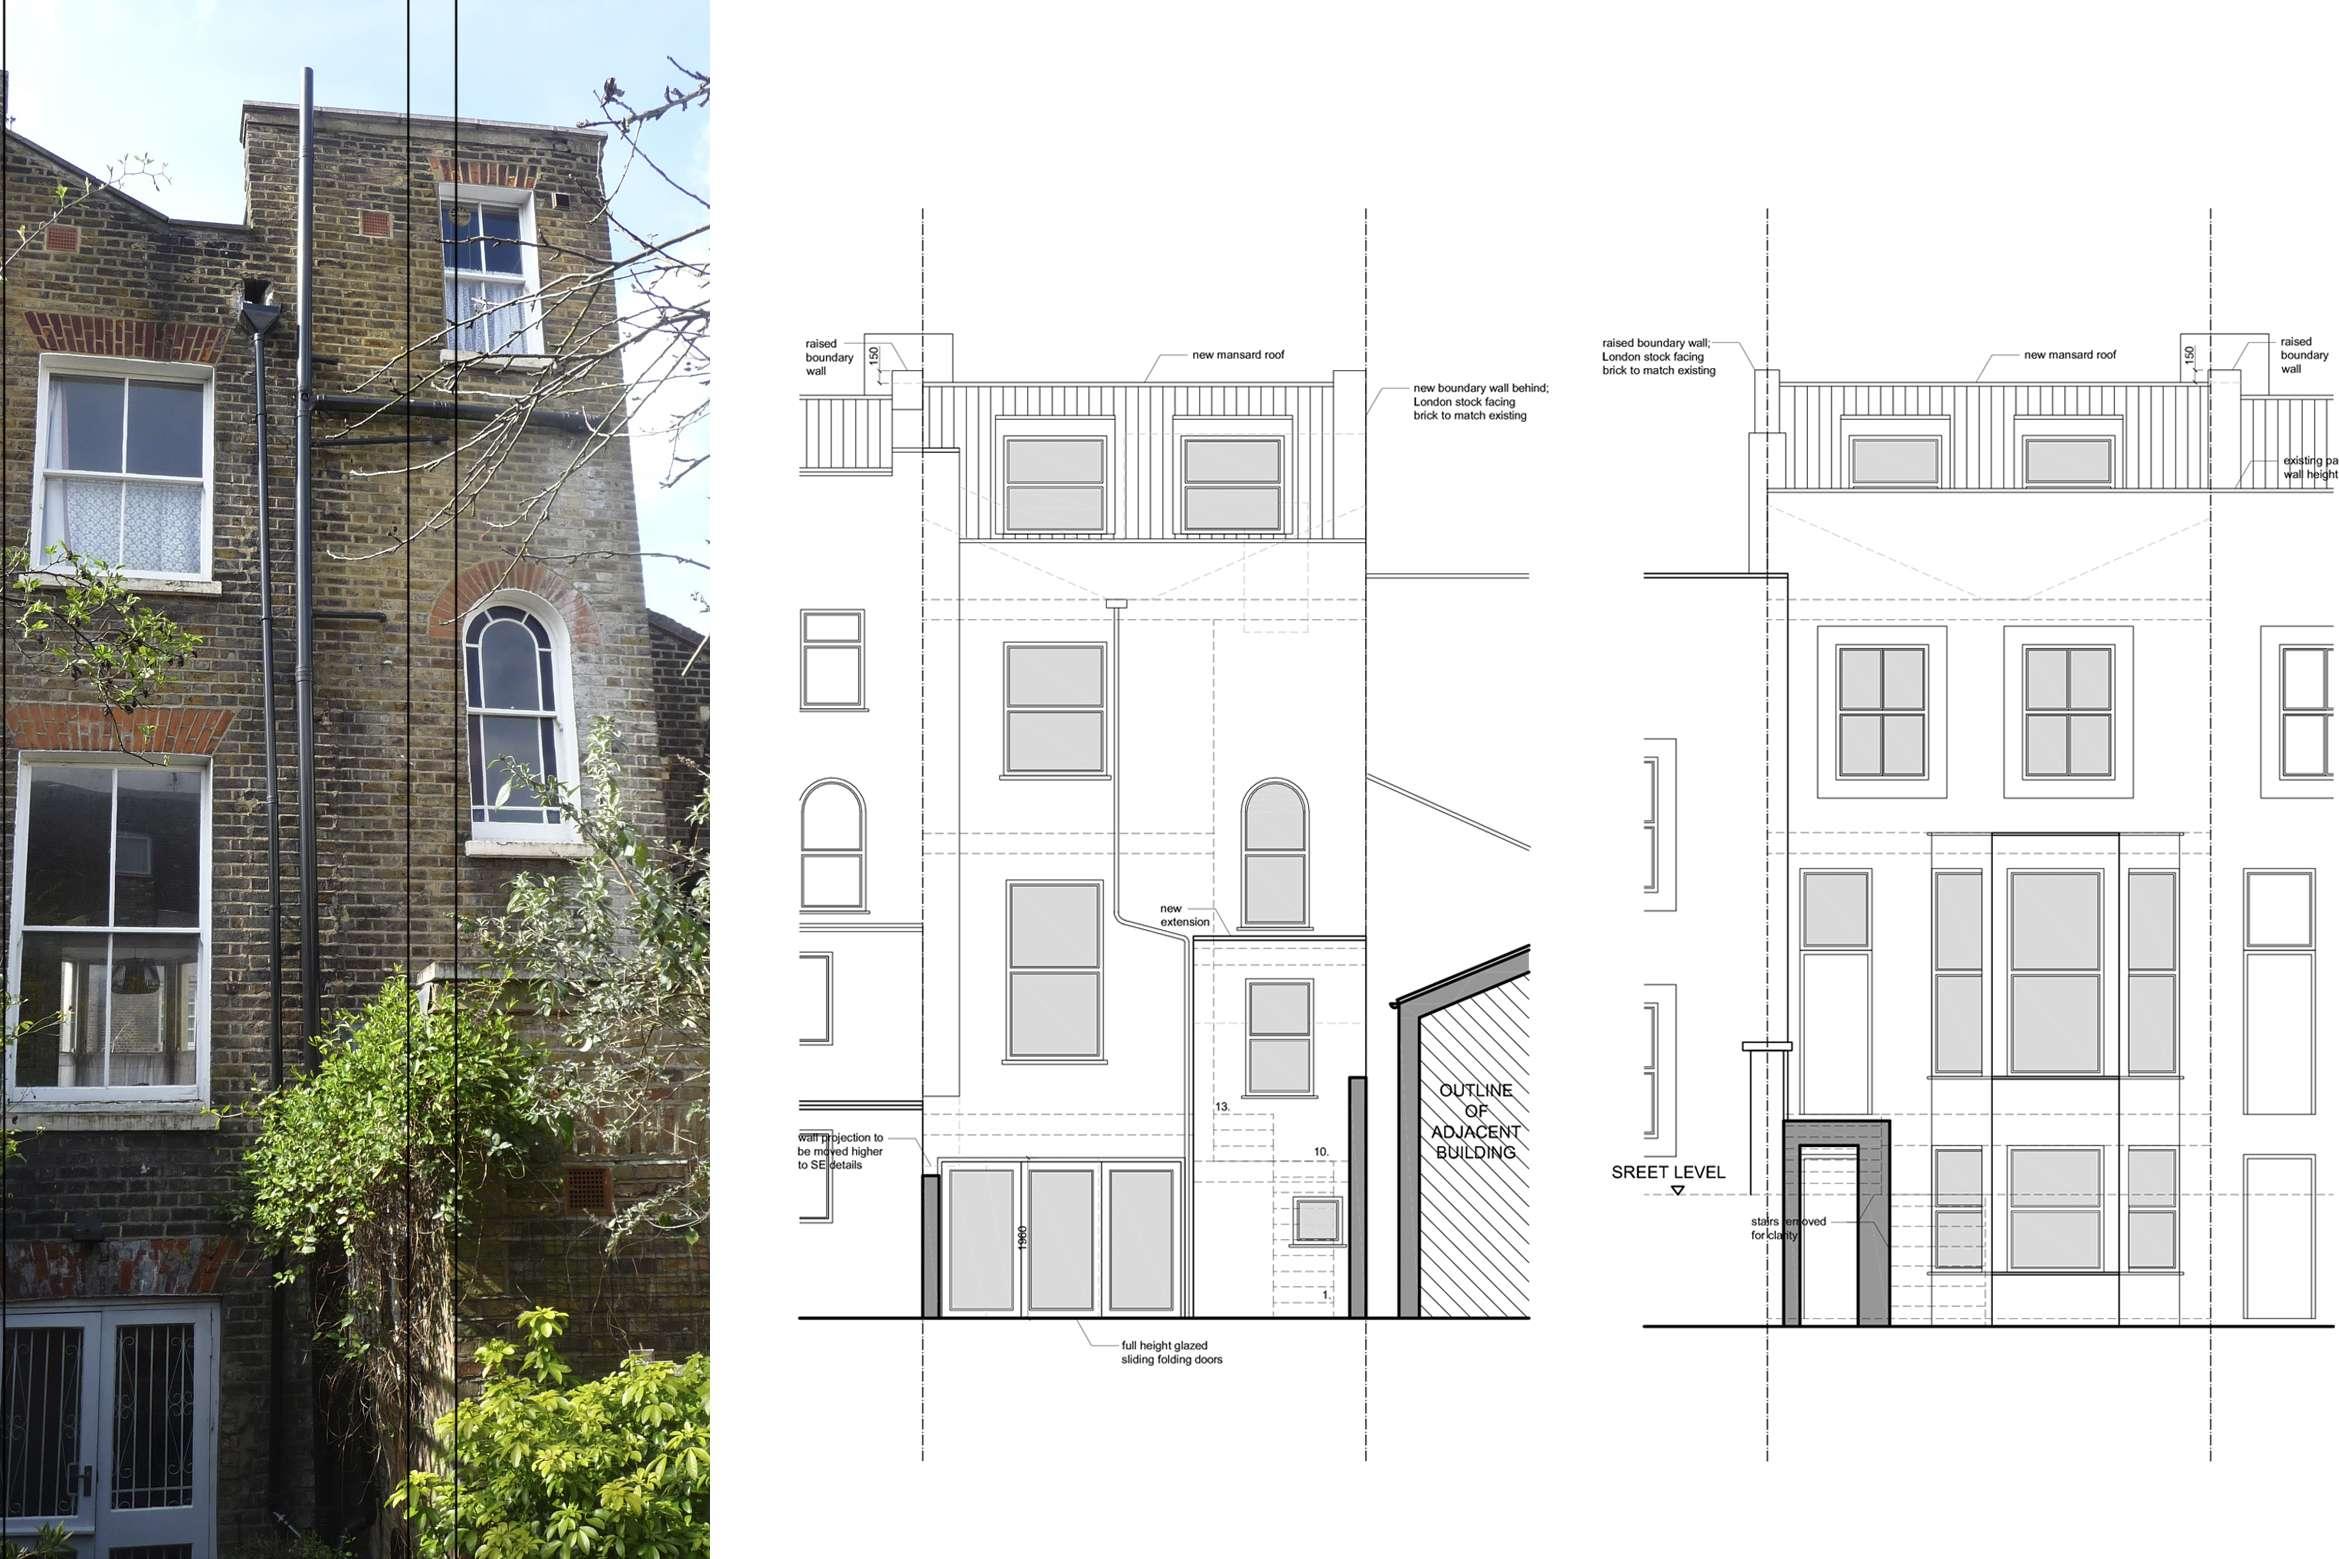 Architect designed mansard roof extension Finsbury Park Islington N7 Elevations 1 Finsbury Park, Islington N7 | Mansard roof extension